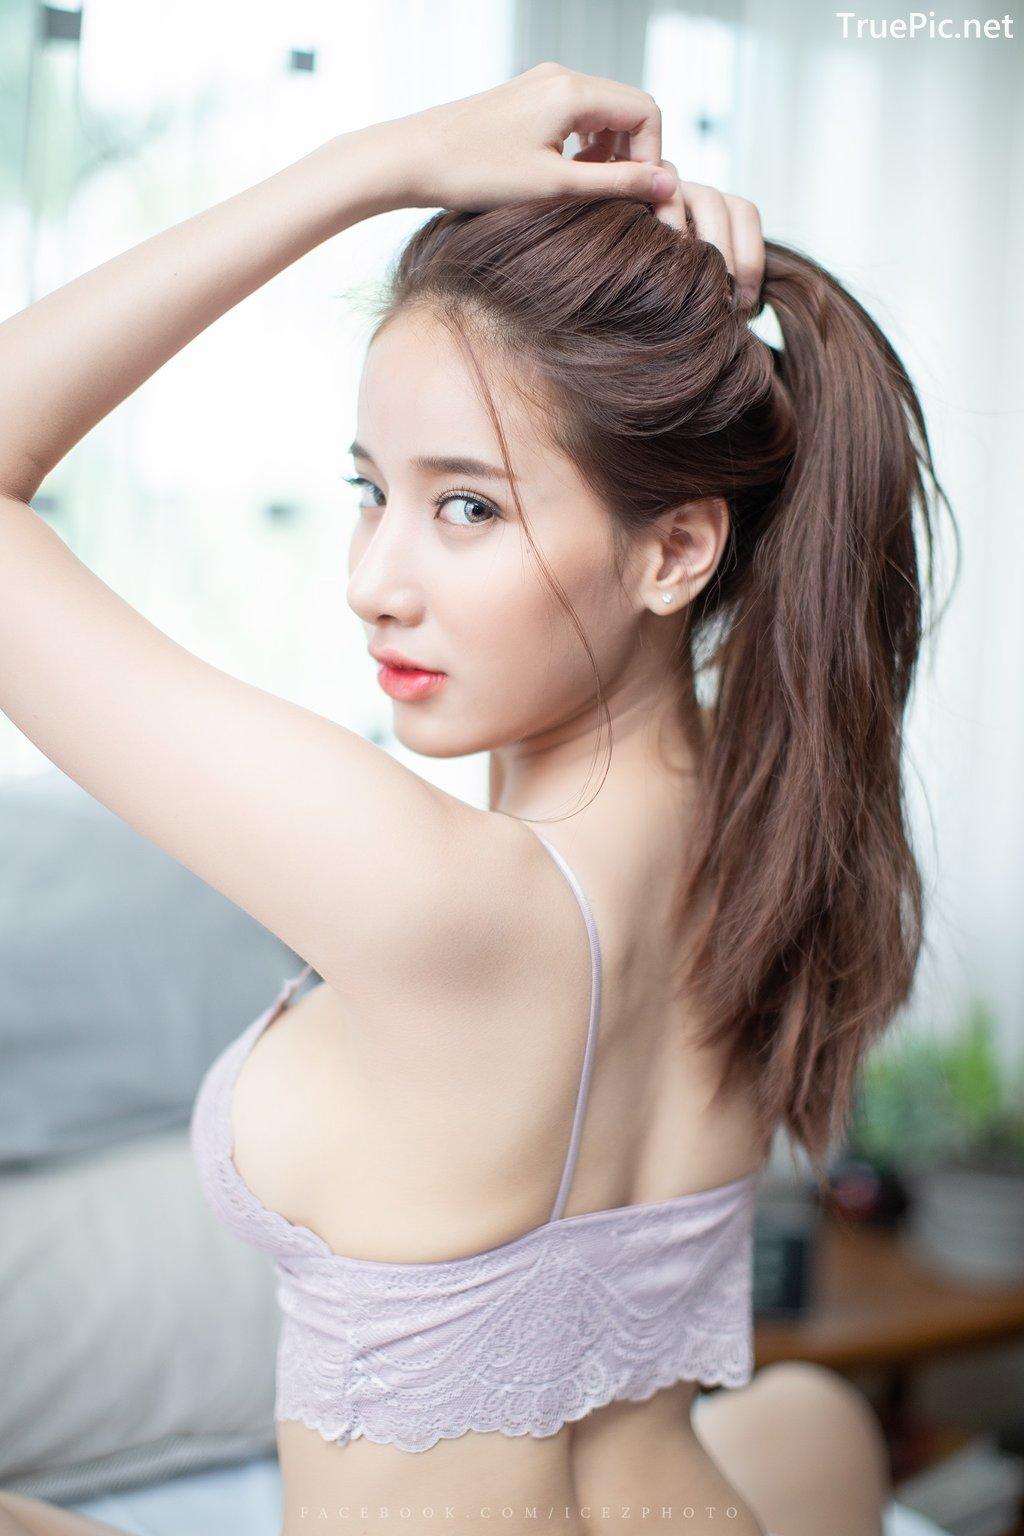 Image-Thailand-Hot-Model-Pichana-Yoosuk-Sexy-Purple-Bra-Shiny-Short-Pants-TruePic.net- Picture-10